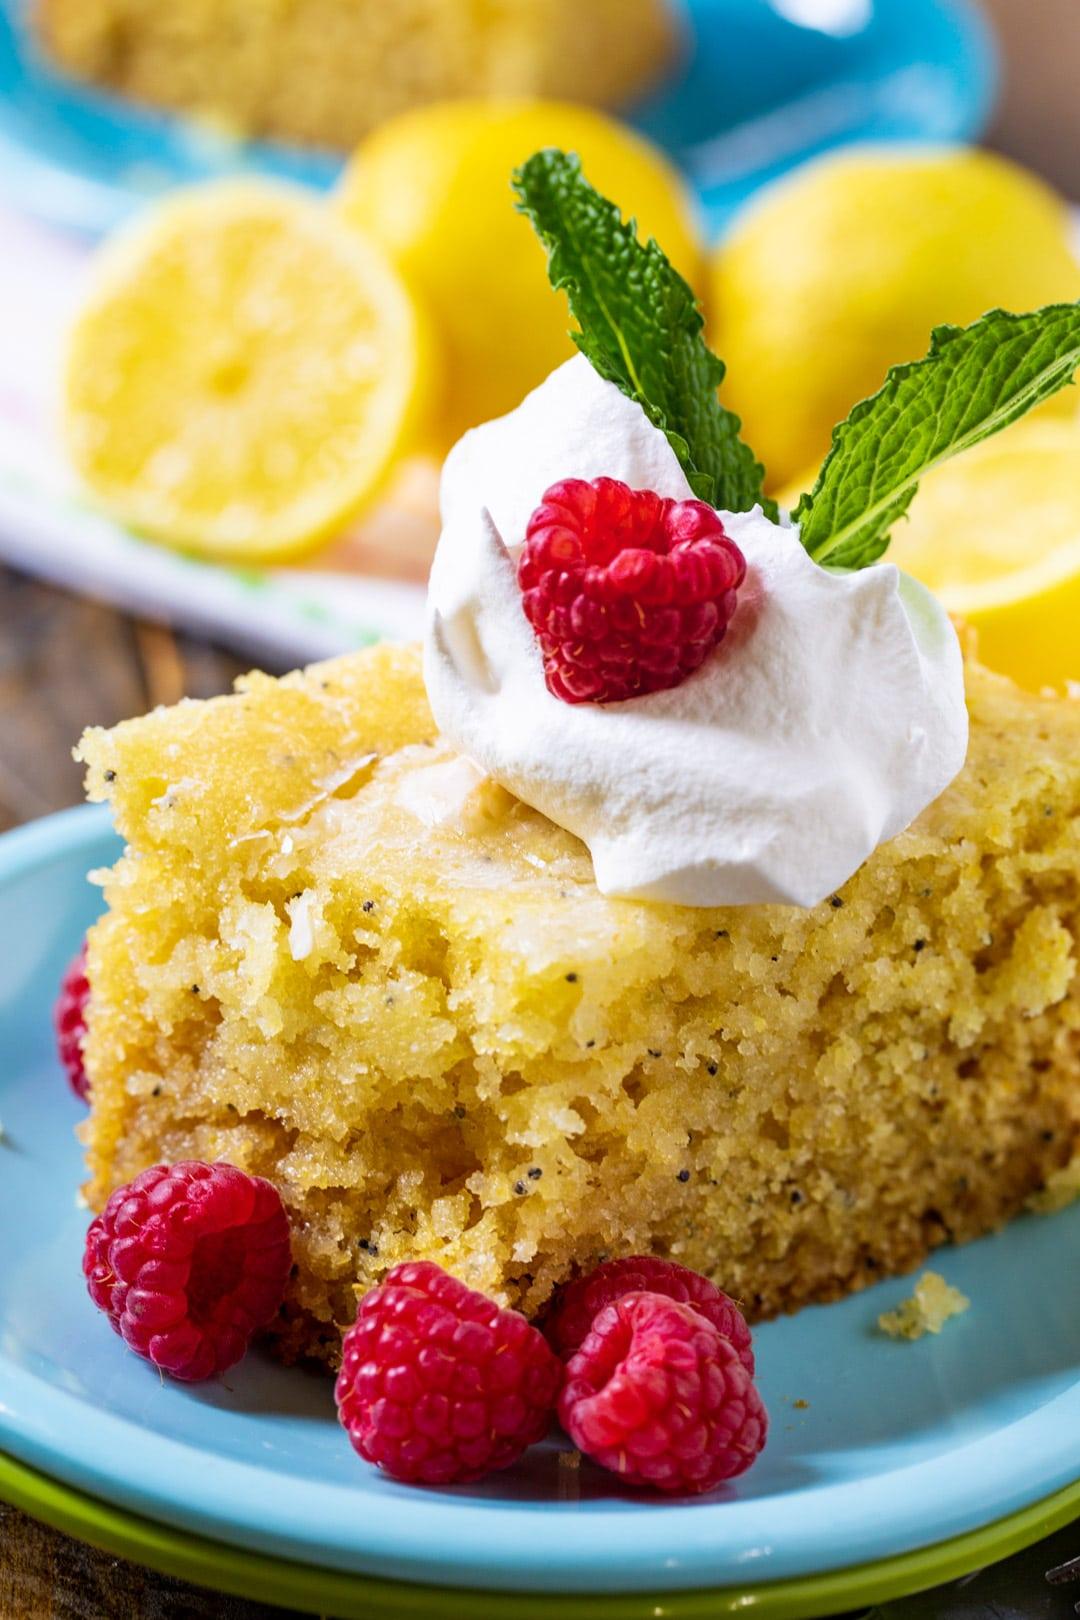 Slice of lemon cake on blue plate with fresh raspberries.